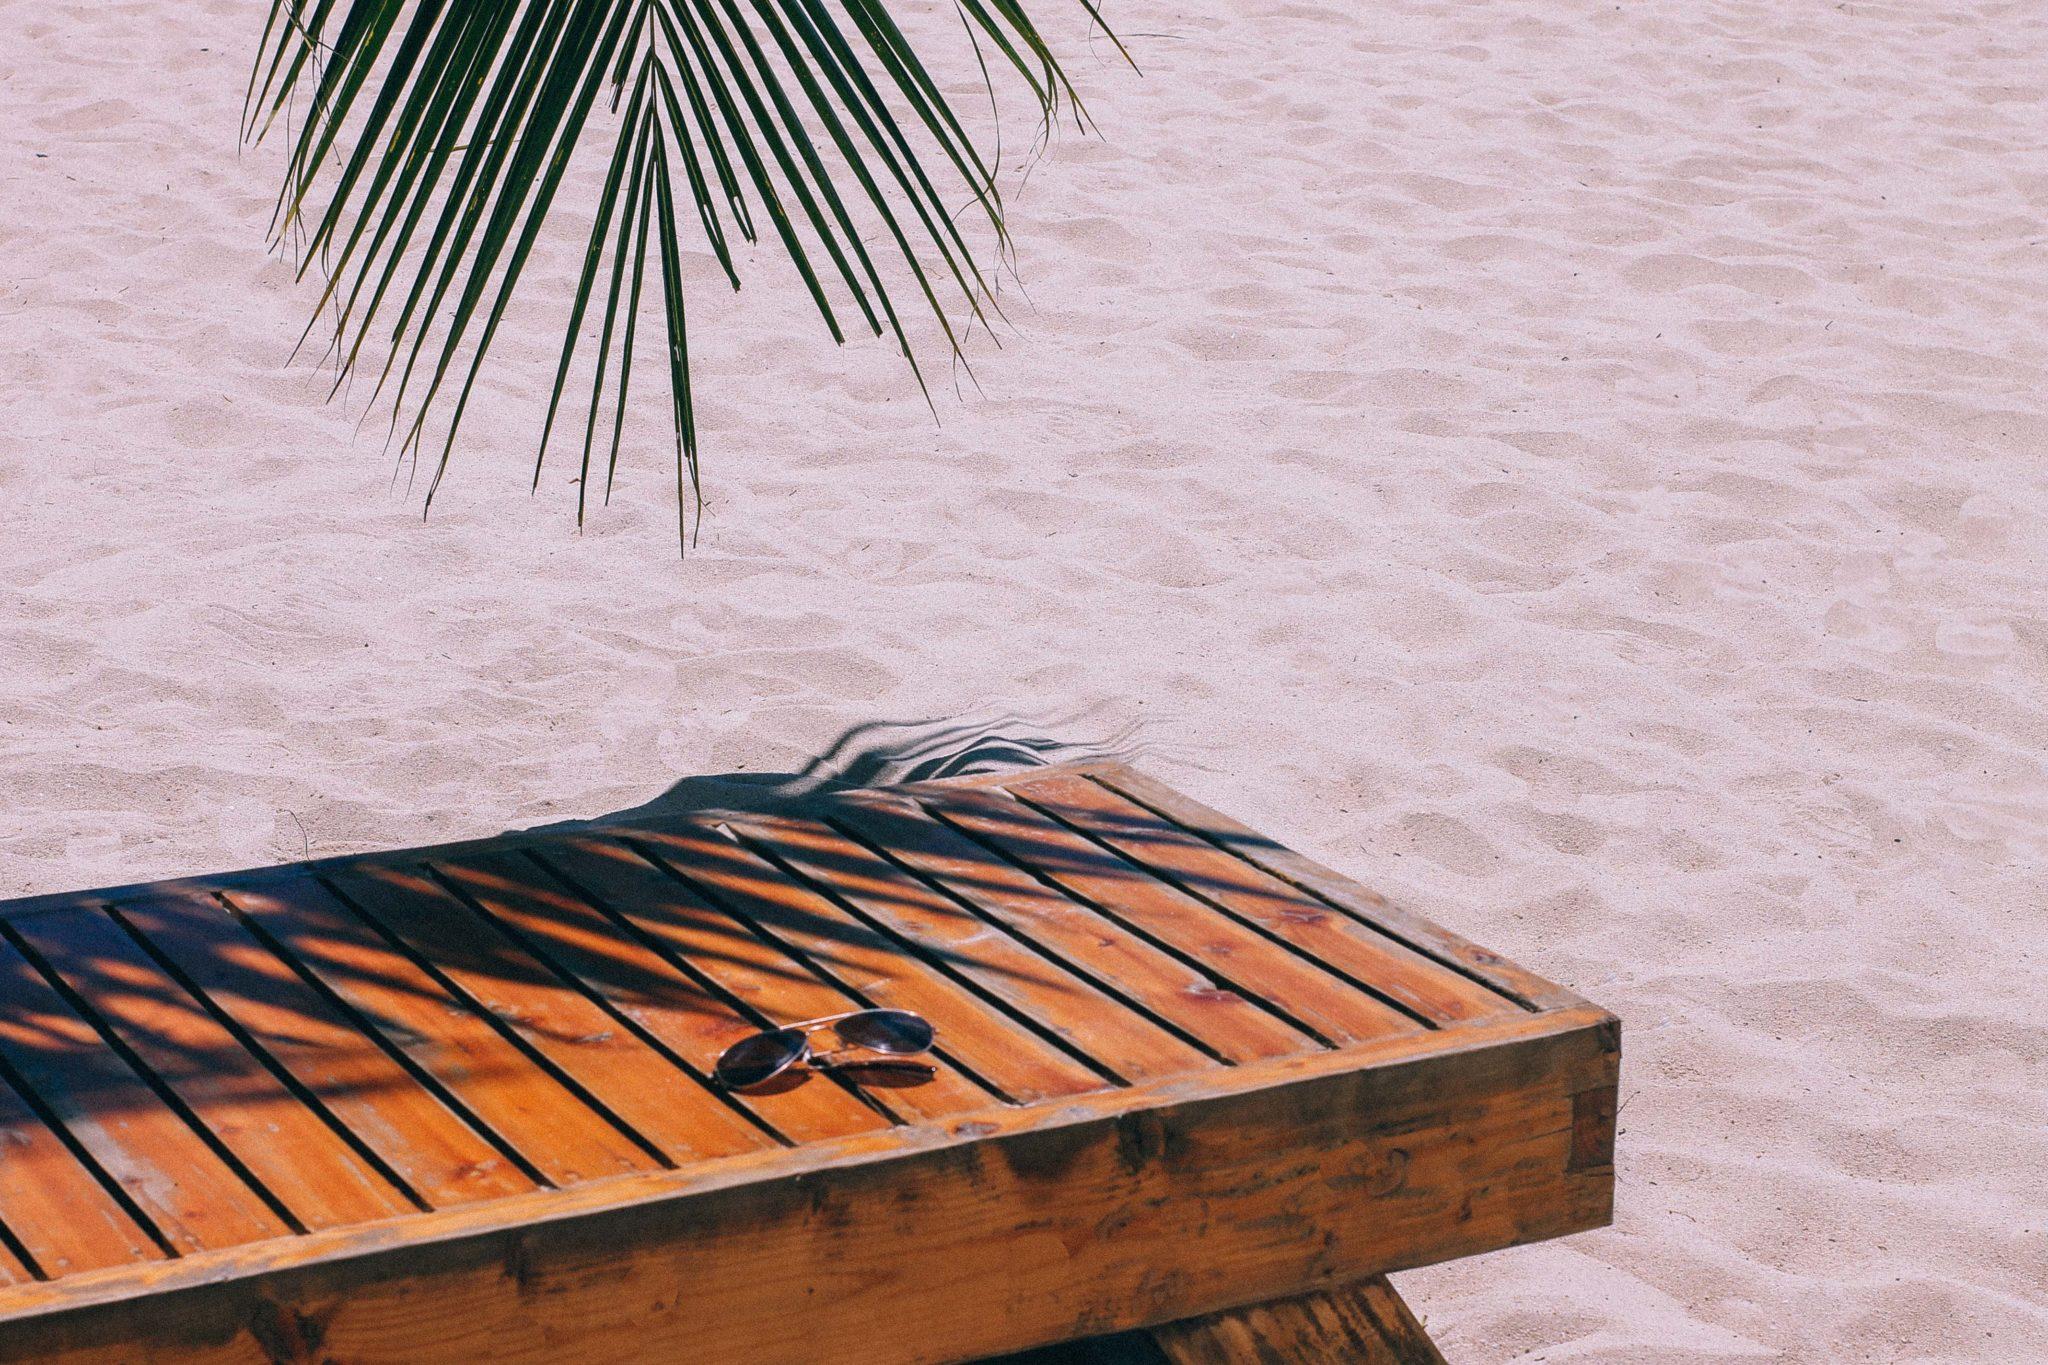 bantayan island cebu philippines